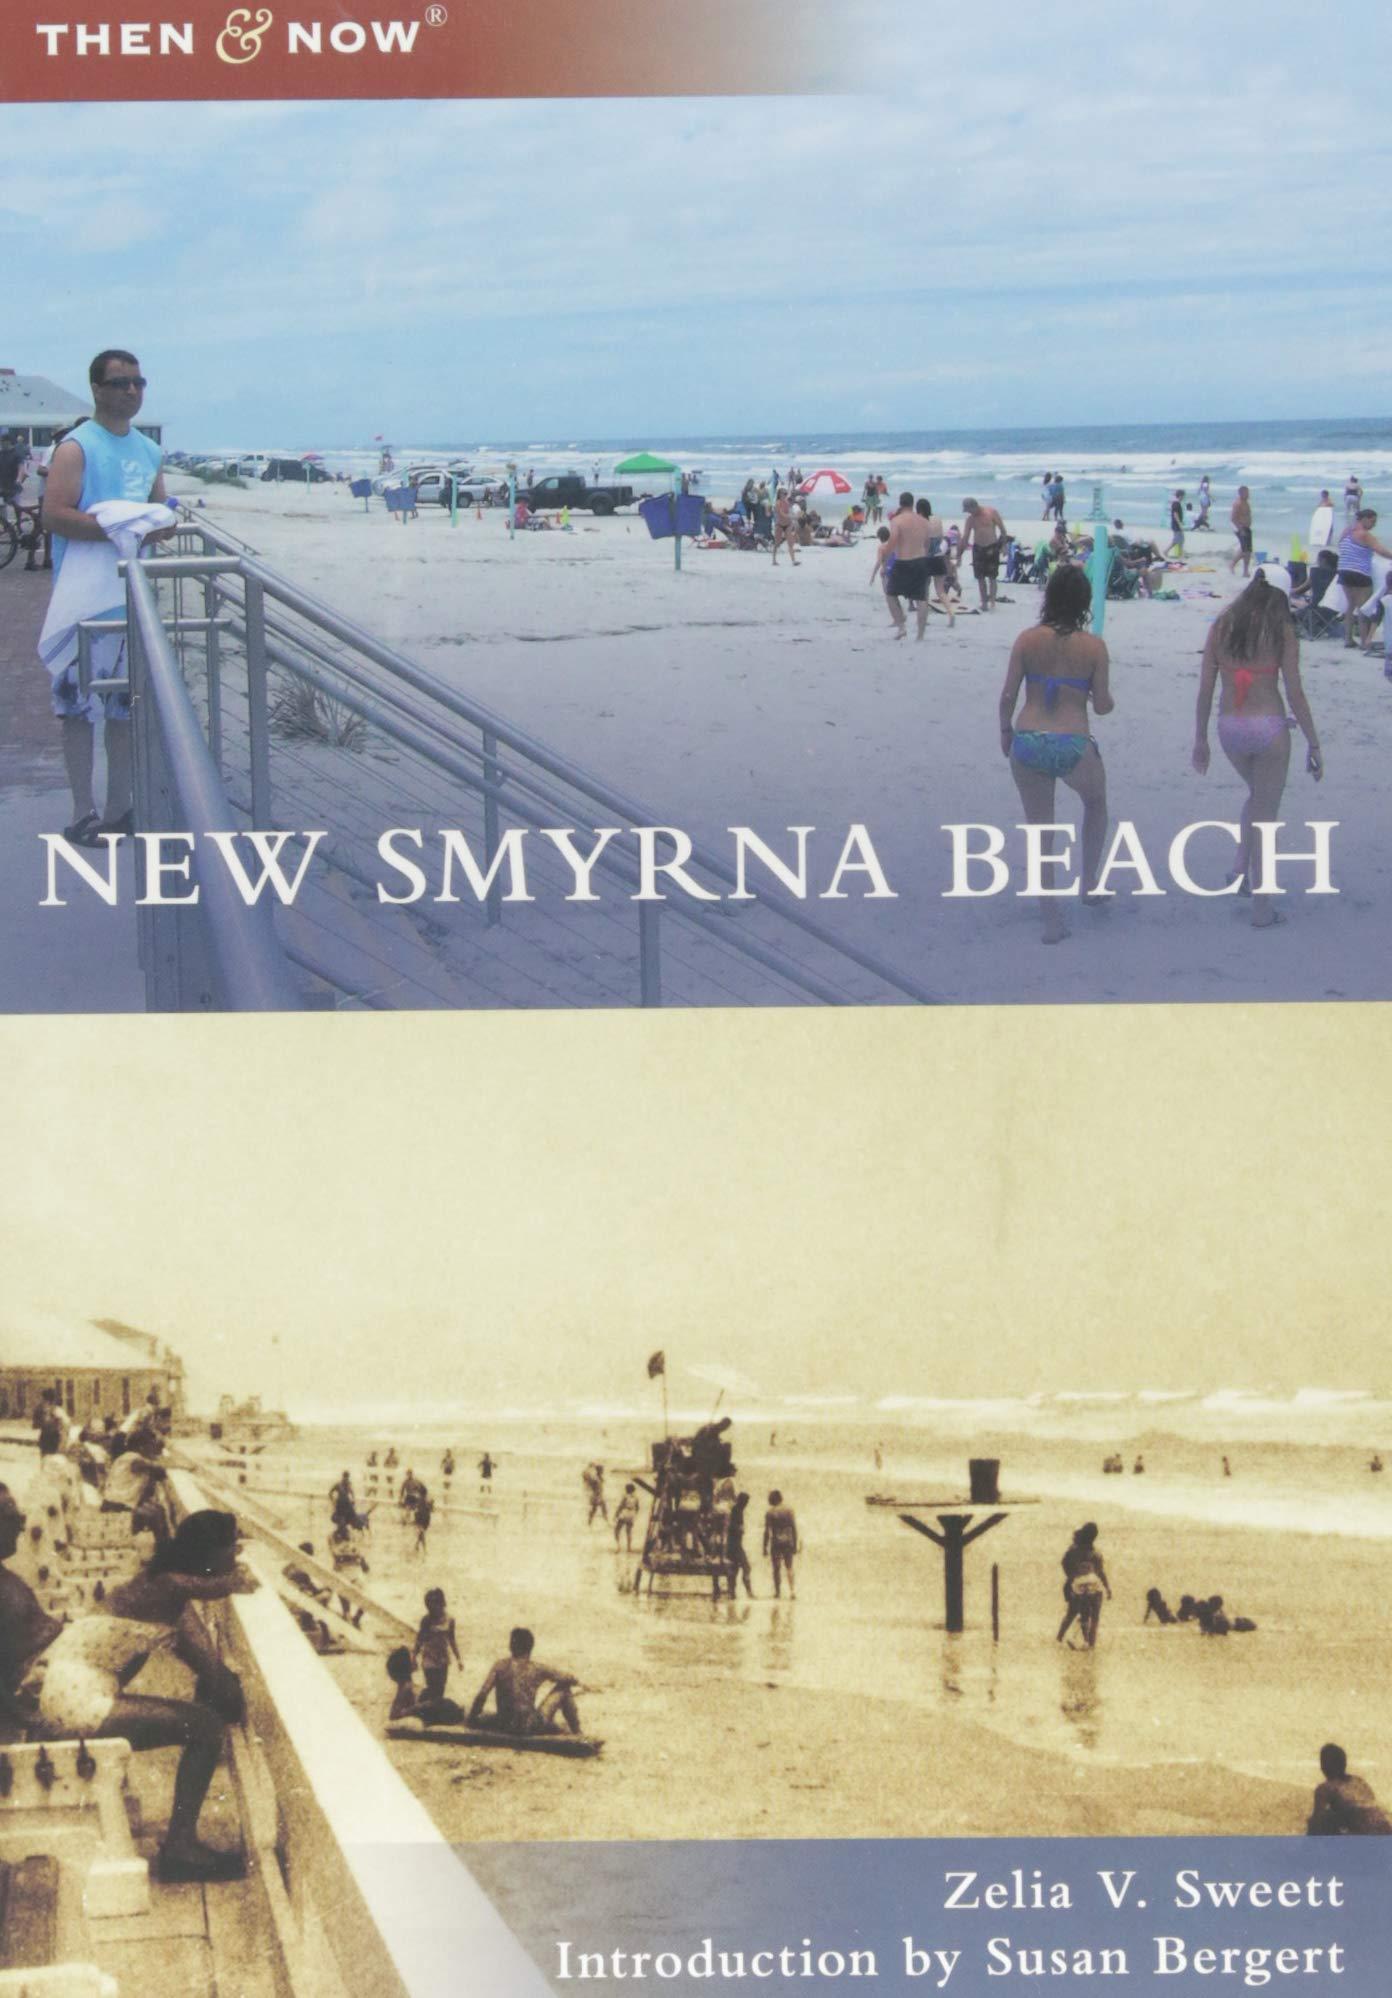 New Symrna Beach >> New Smyrna Beach Then And Now Zelia V Sweett Susan Bergert